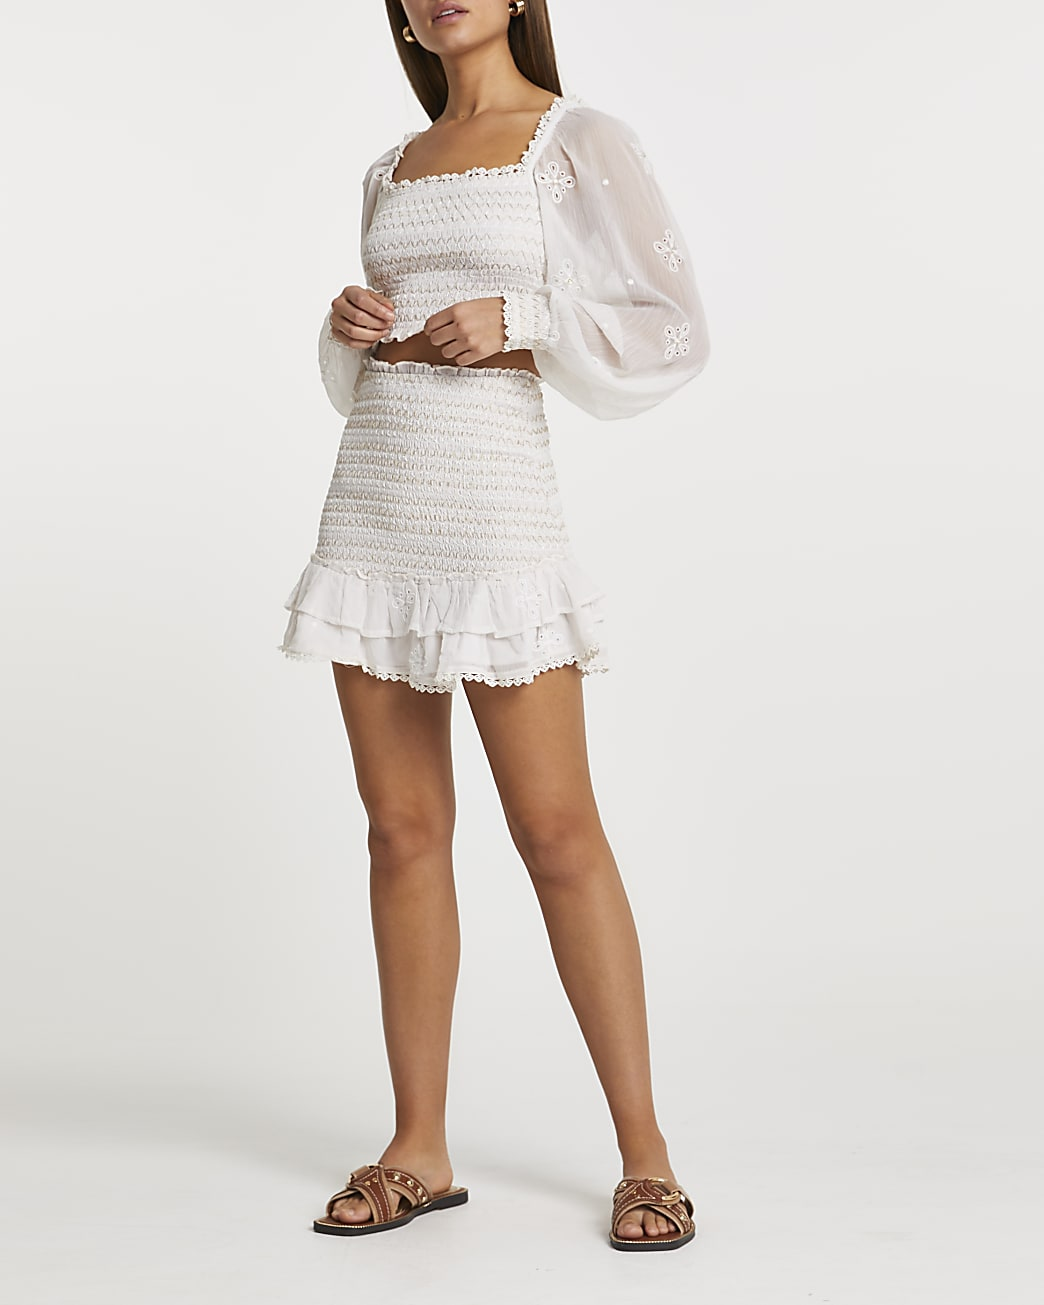 White shirred chiffon tiered mini skirt